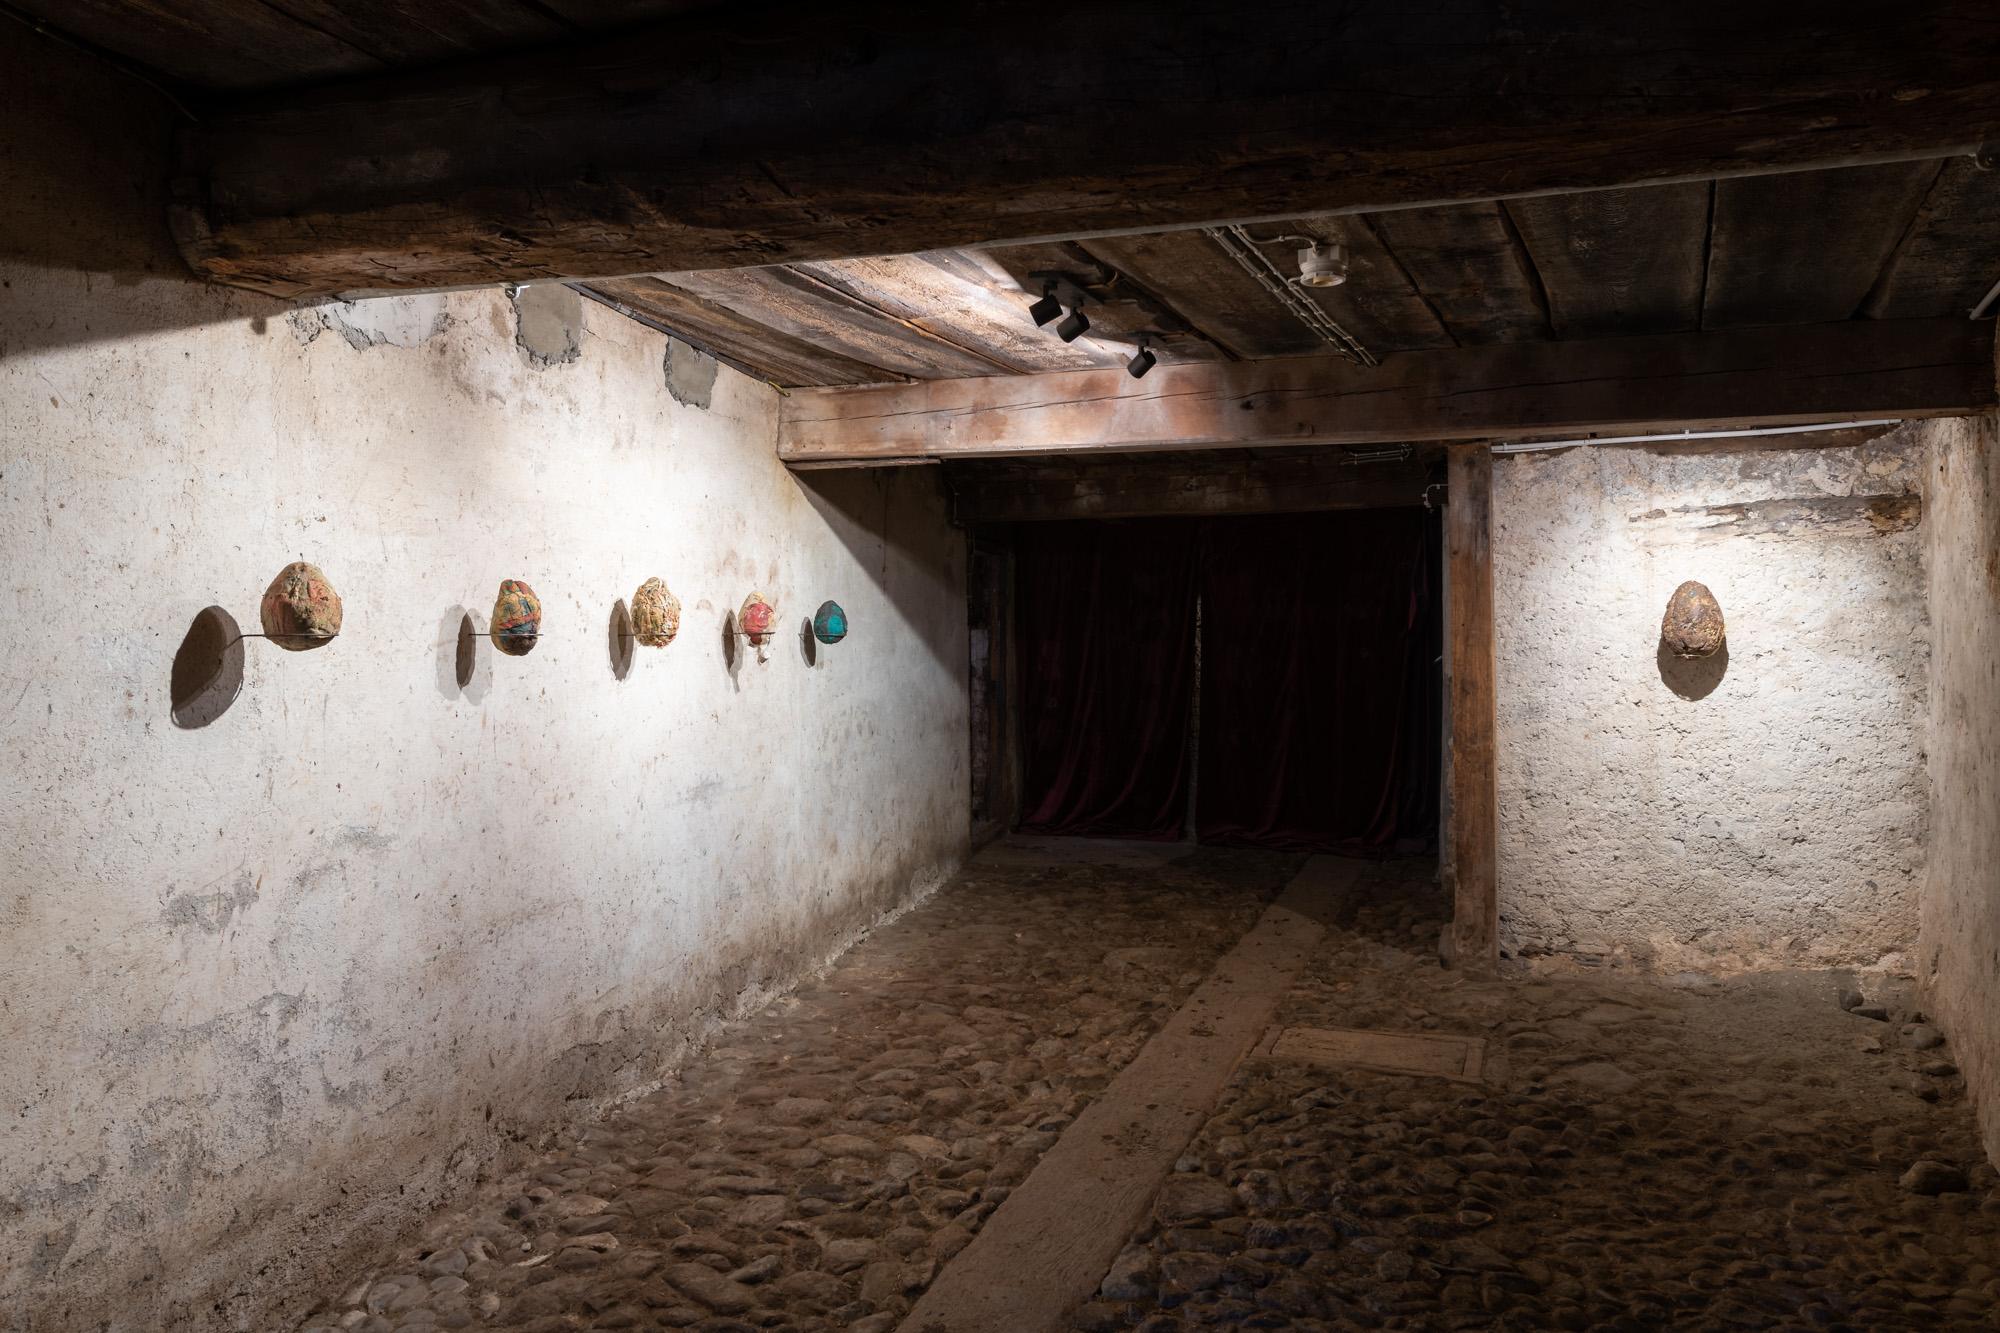 exhibitions/PEDRO/Wip/PedroWirz_2019_Madulain_DSC5366_web_(c)Ben_Koechlin.jpg